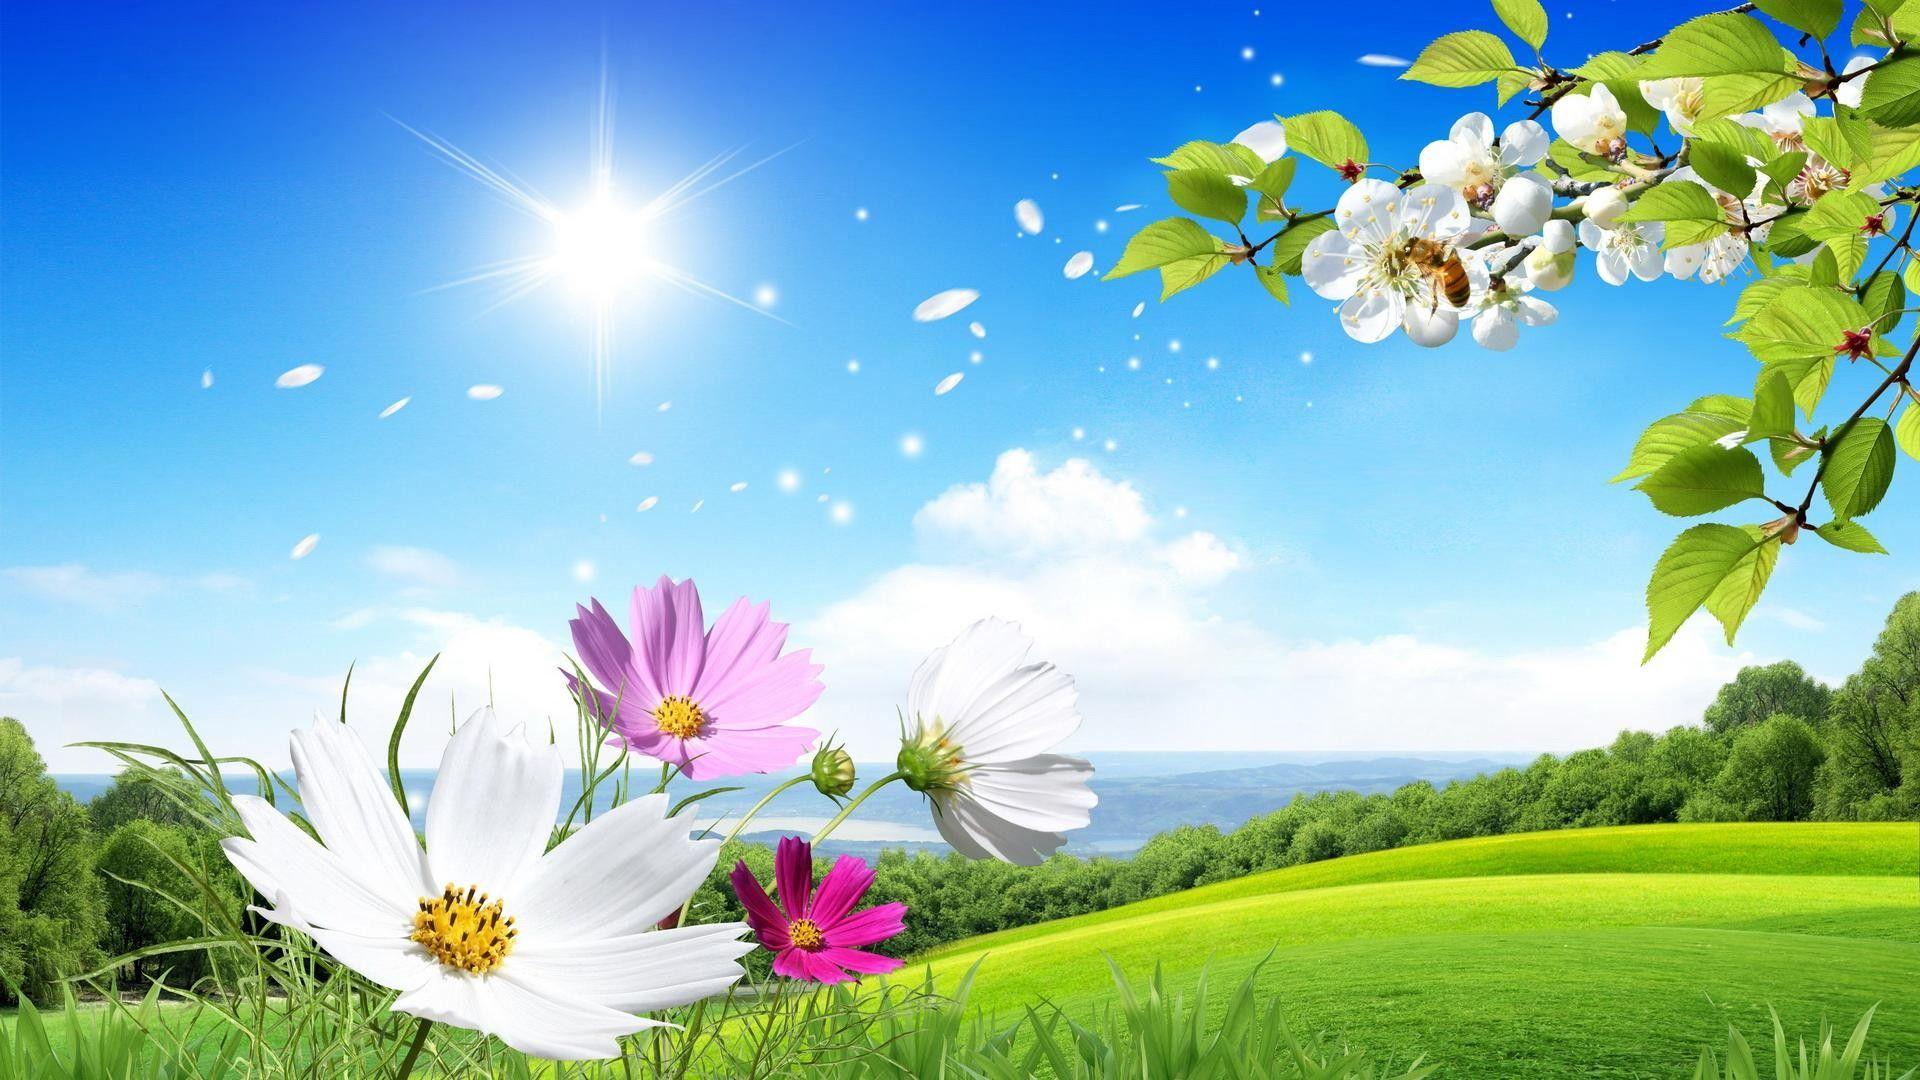 Good Morning Flowers Wallpapers Jpg 1920 1080 Beautiful Summer Wallpaper Scenery Wallpaper Beautiful Scenery Wallpaper